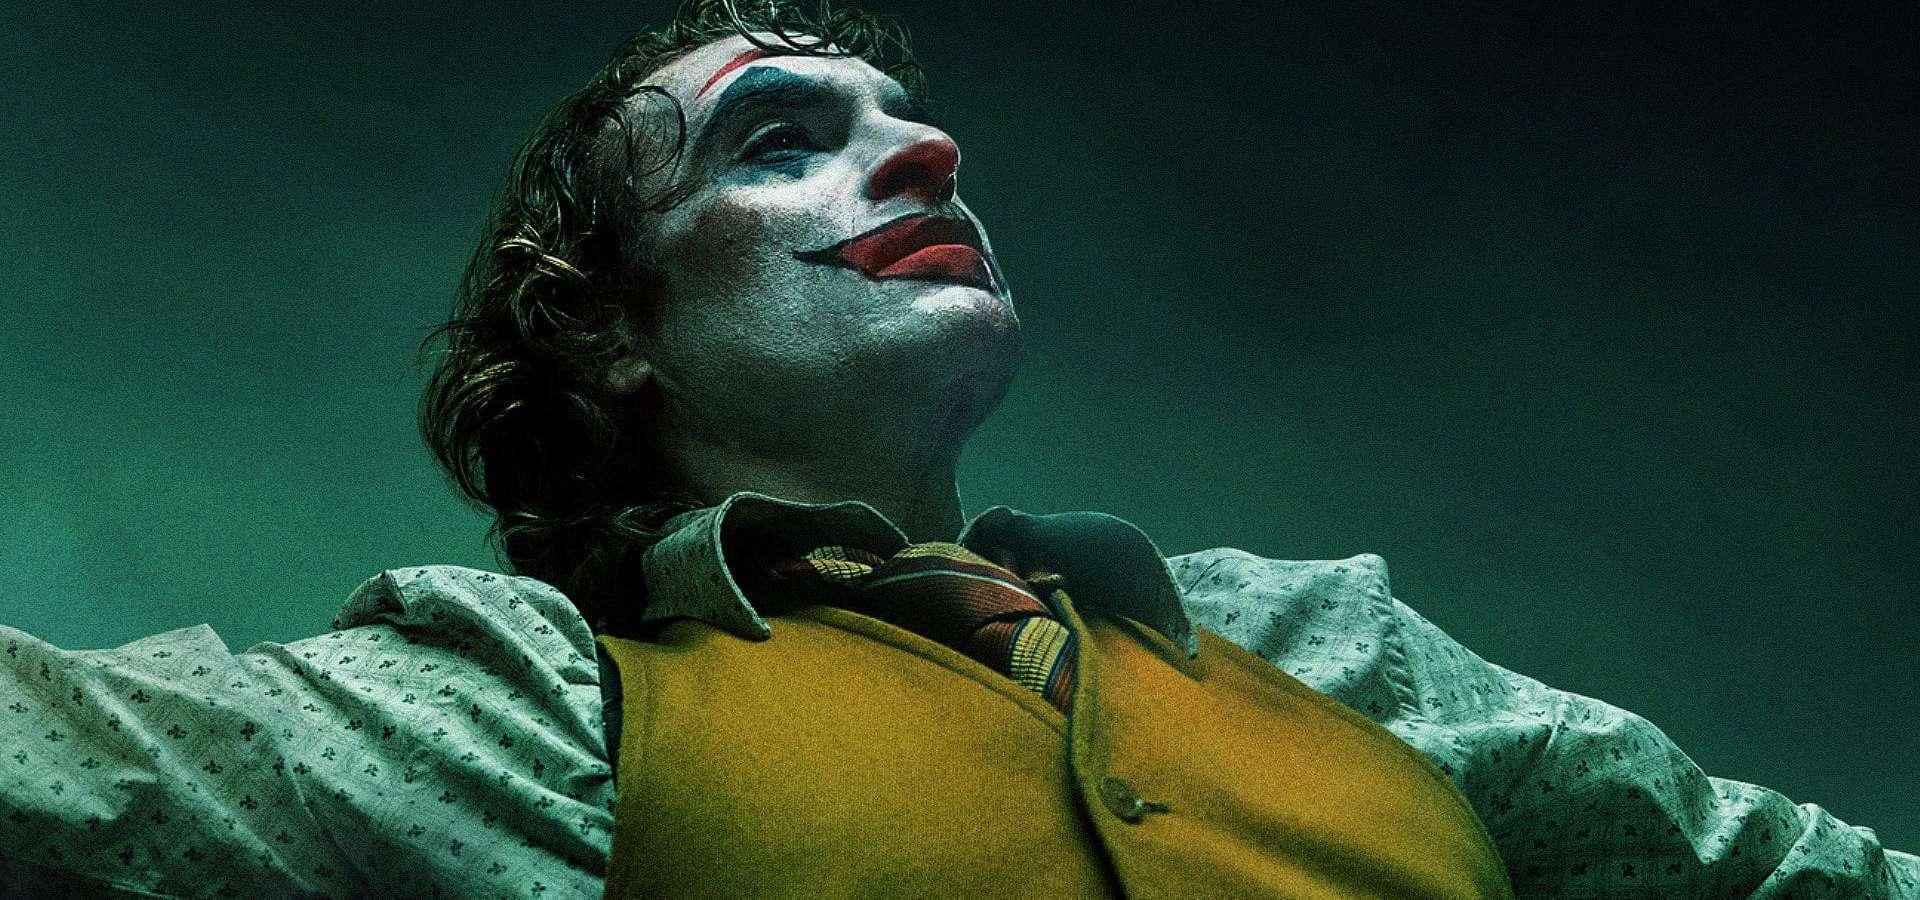 Batman: El Caballero de la Noche Joker quejas Todd Phillips